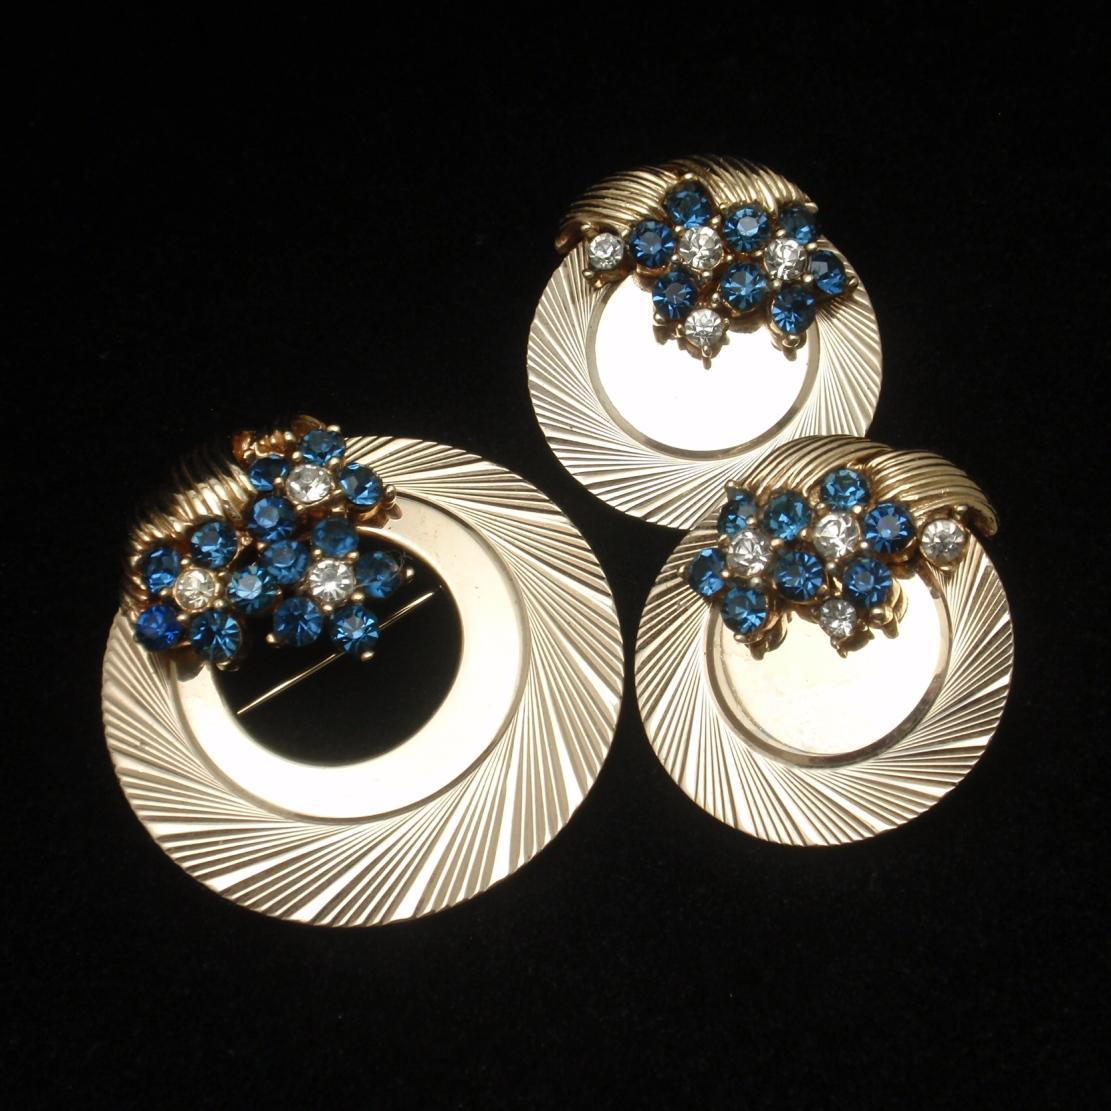 Boucher Circle Pin & Earrings Set Rhinestones Vintage